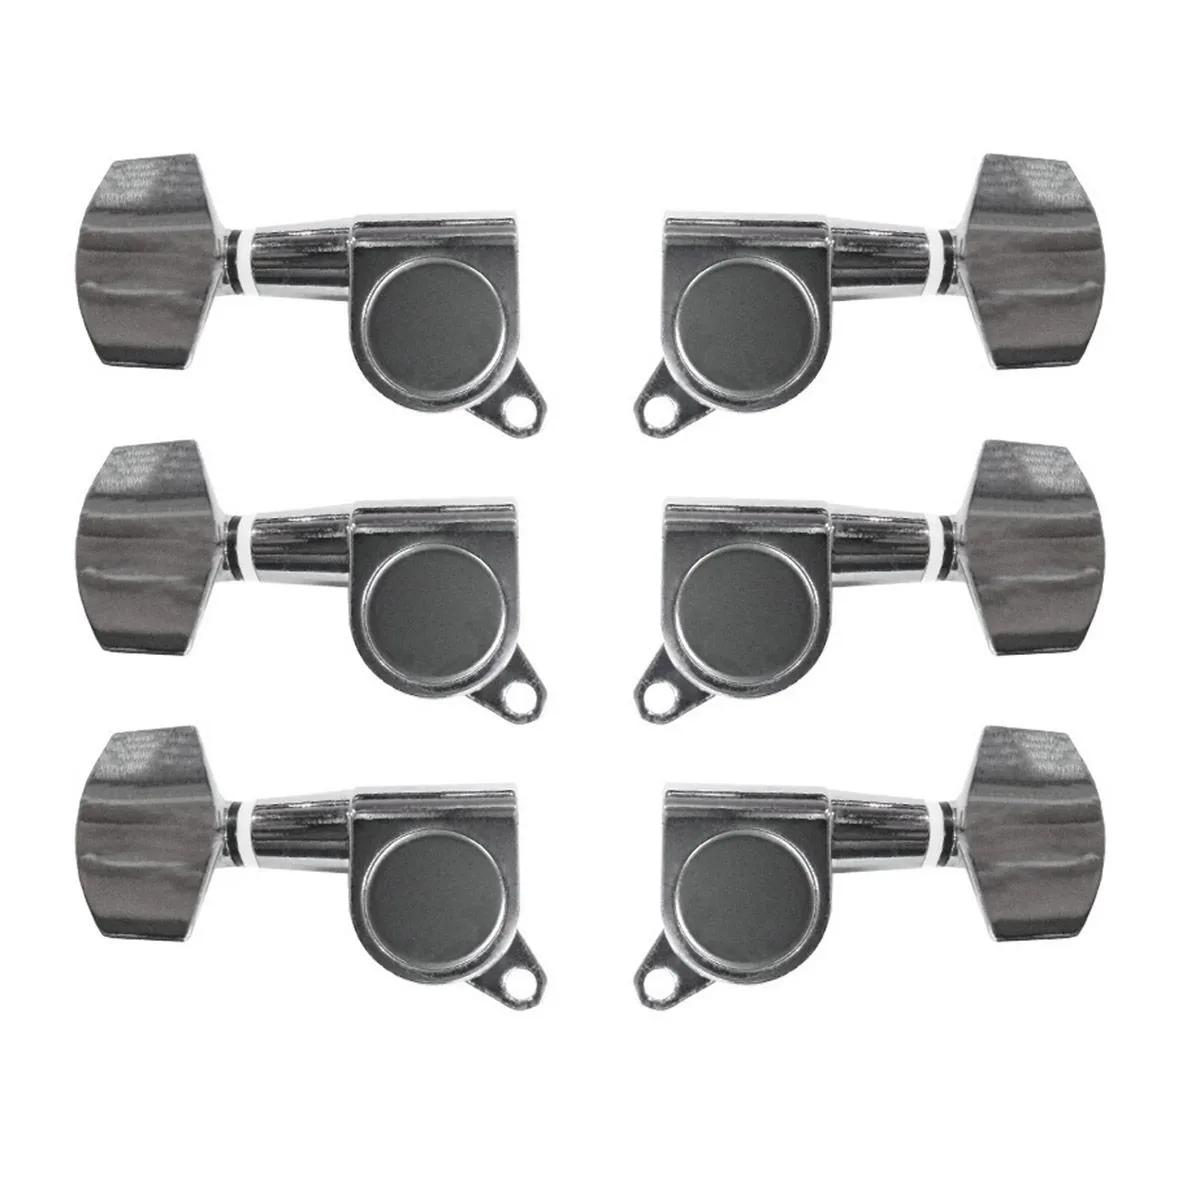 Tarraxas Ronsani MHV-600 Blindada para Violão Aço